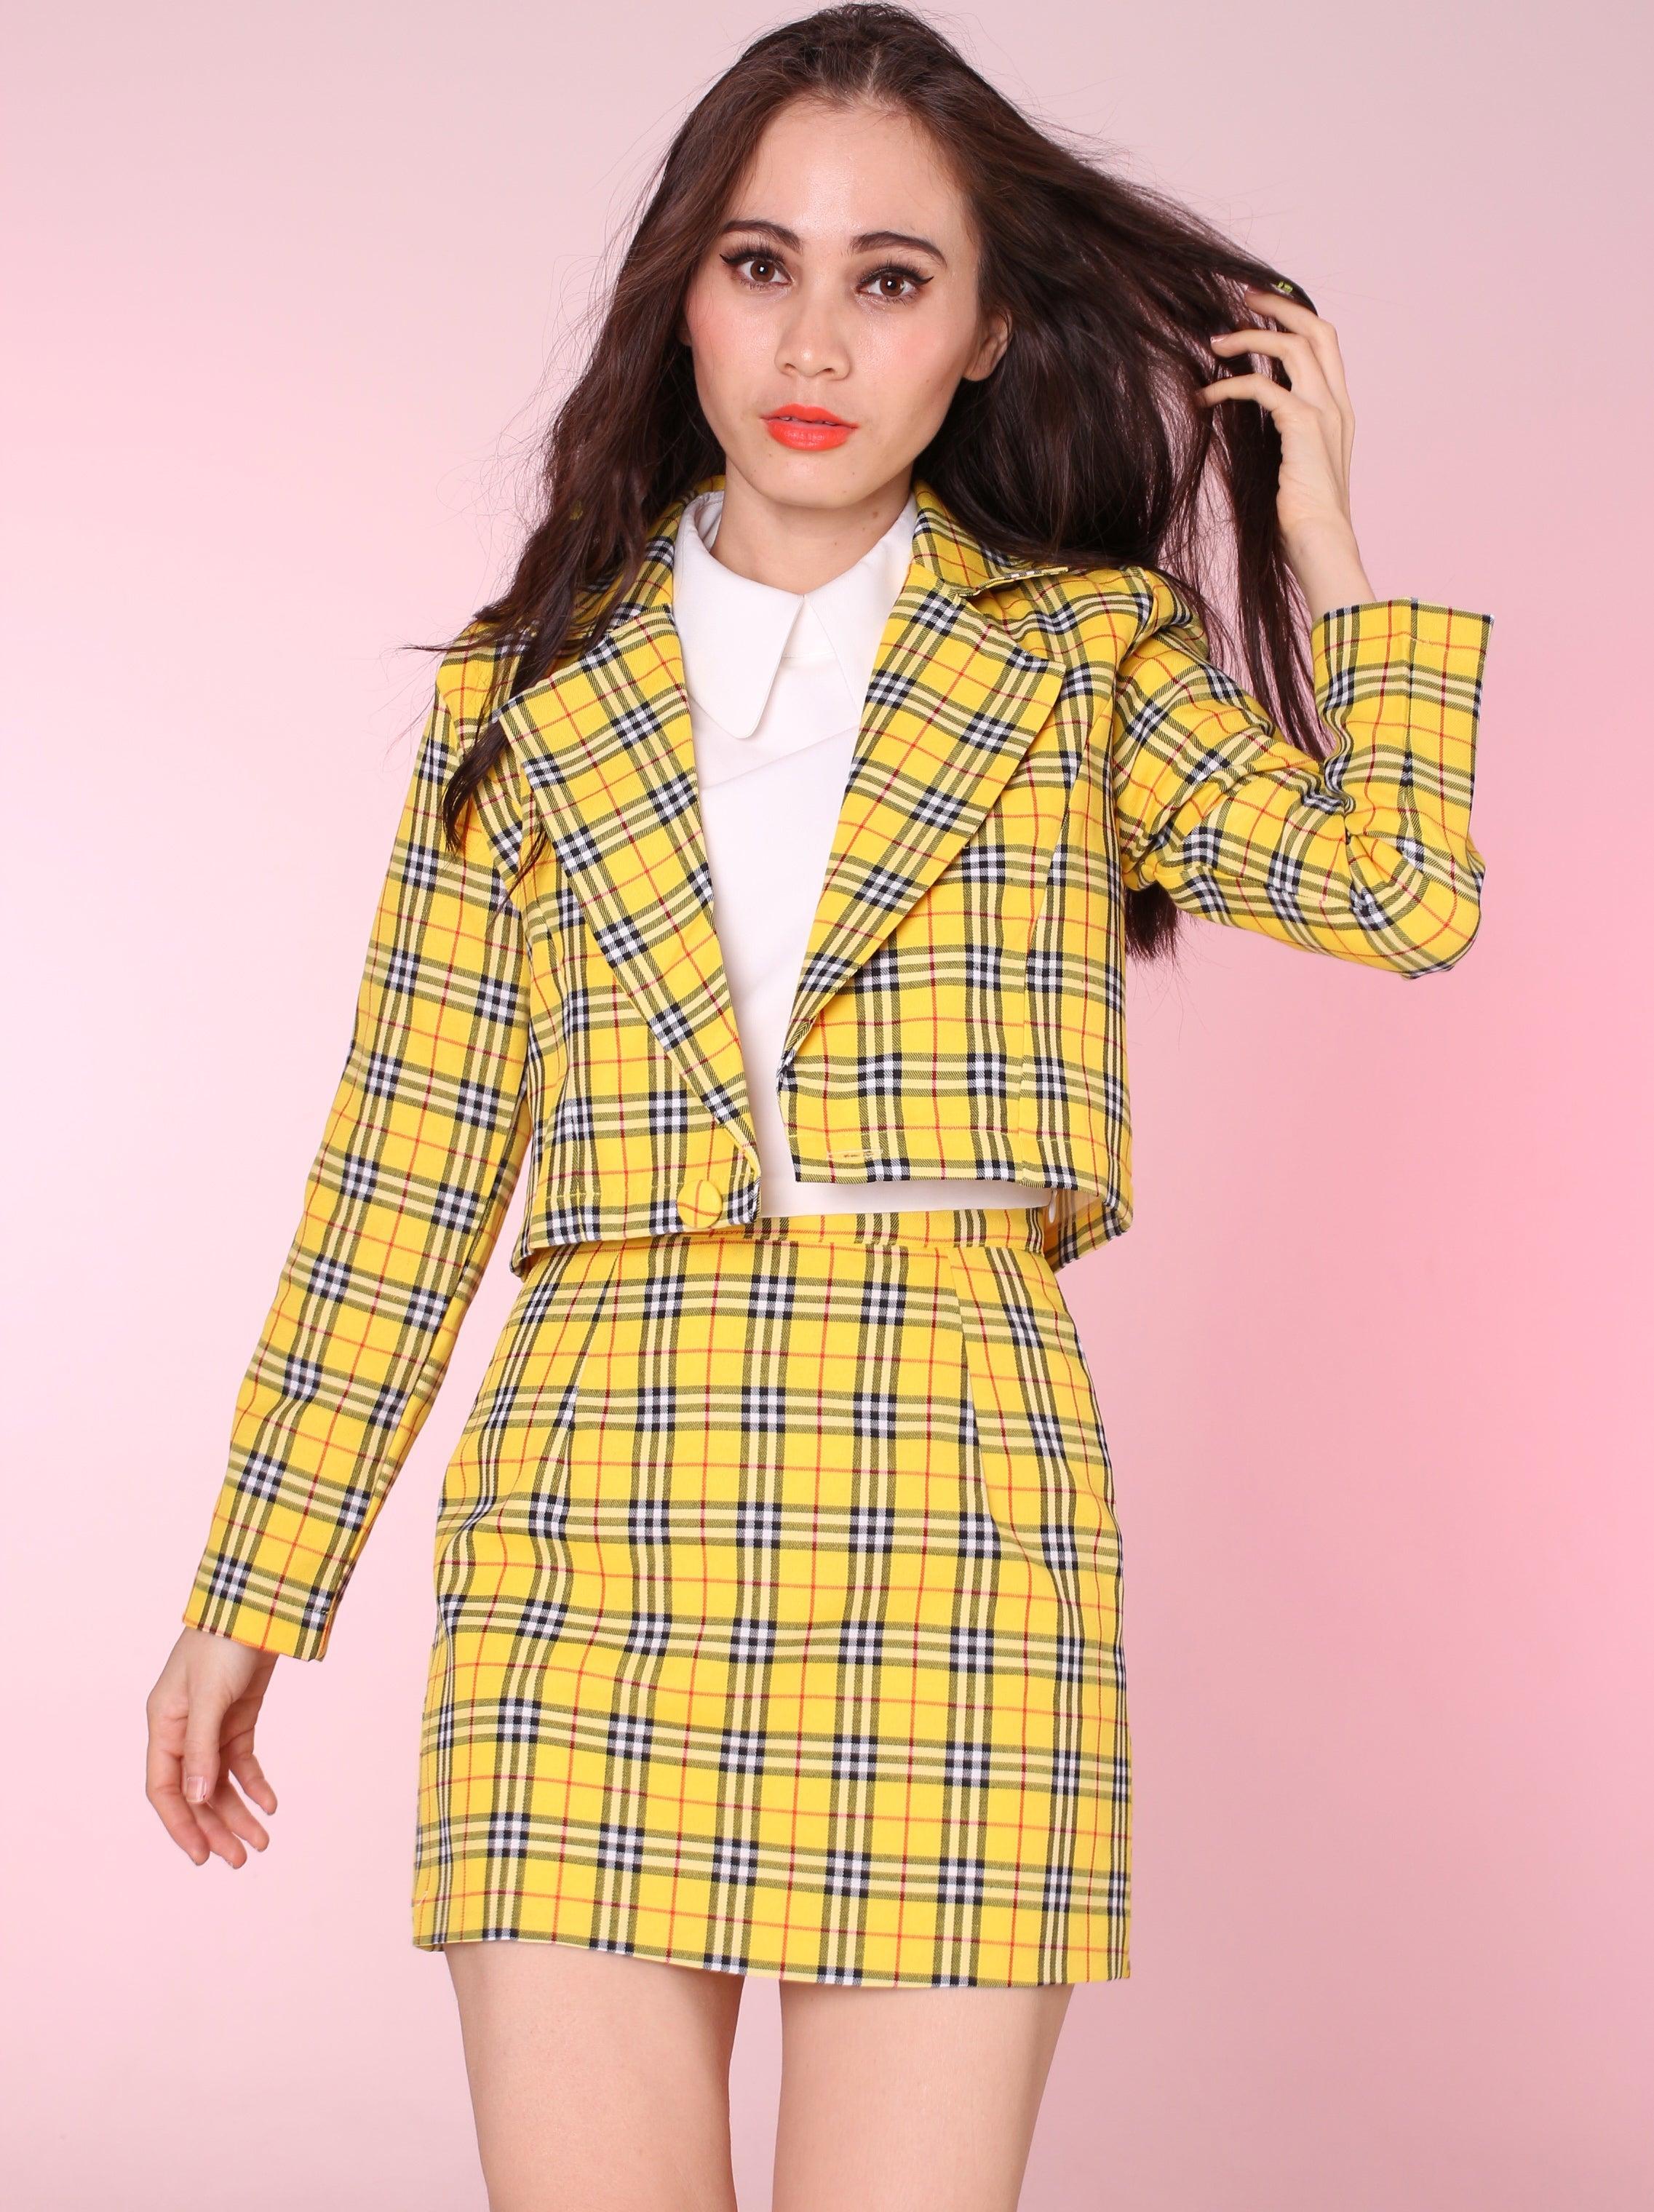 Image of Ready To Post , Cher Yellow Tartan Blazer \u0026 Skirt Set